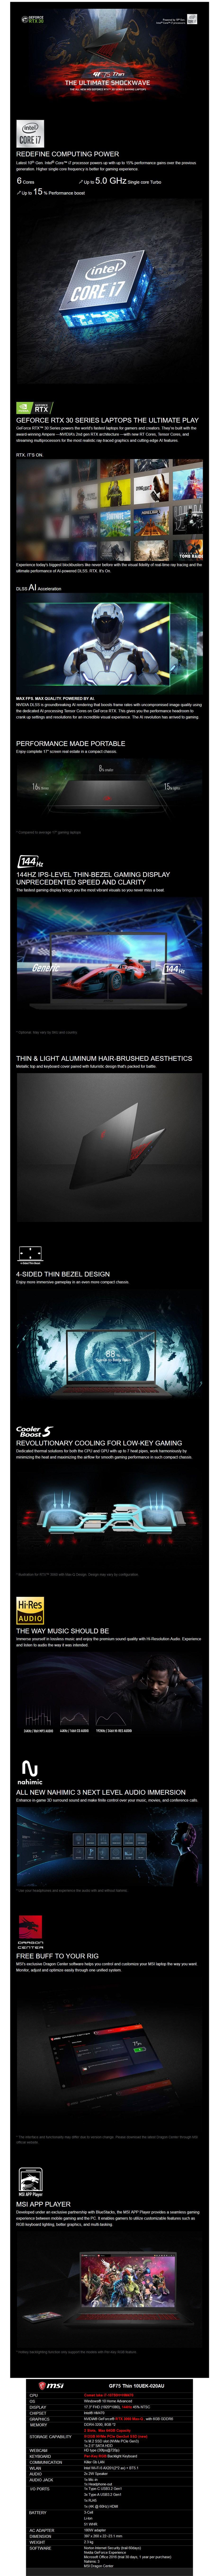 "MSI GF75 Thin 10UEK 17.3"" 144Hz Gaming Notebook i7-10750H 16GB 512GB RTX3060 W10 - Overview 1"